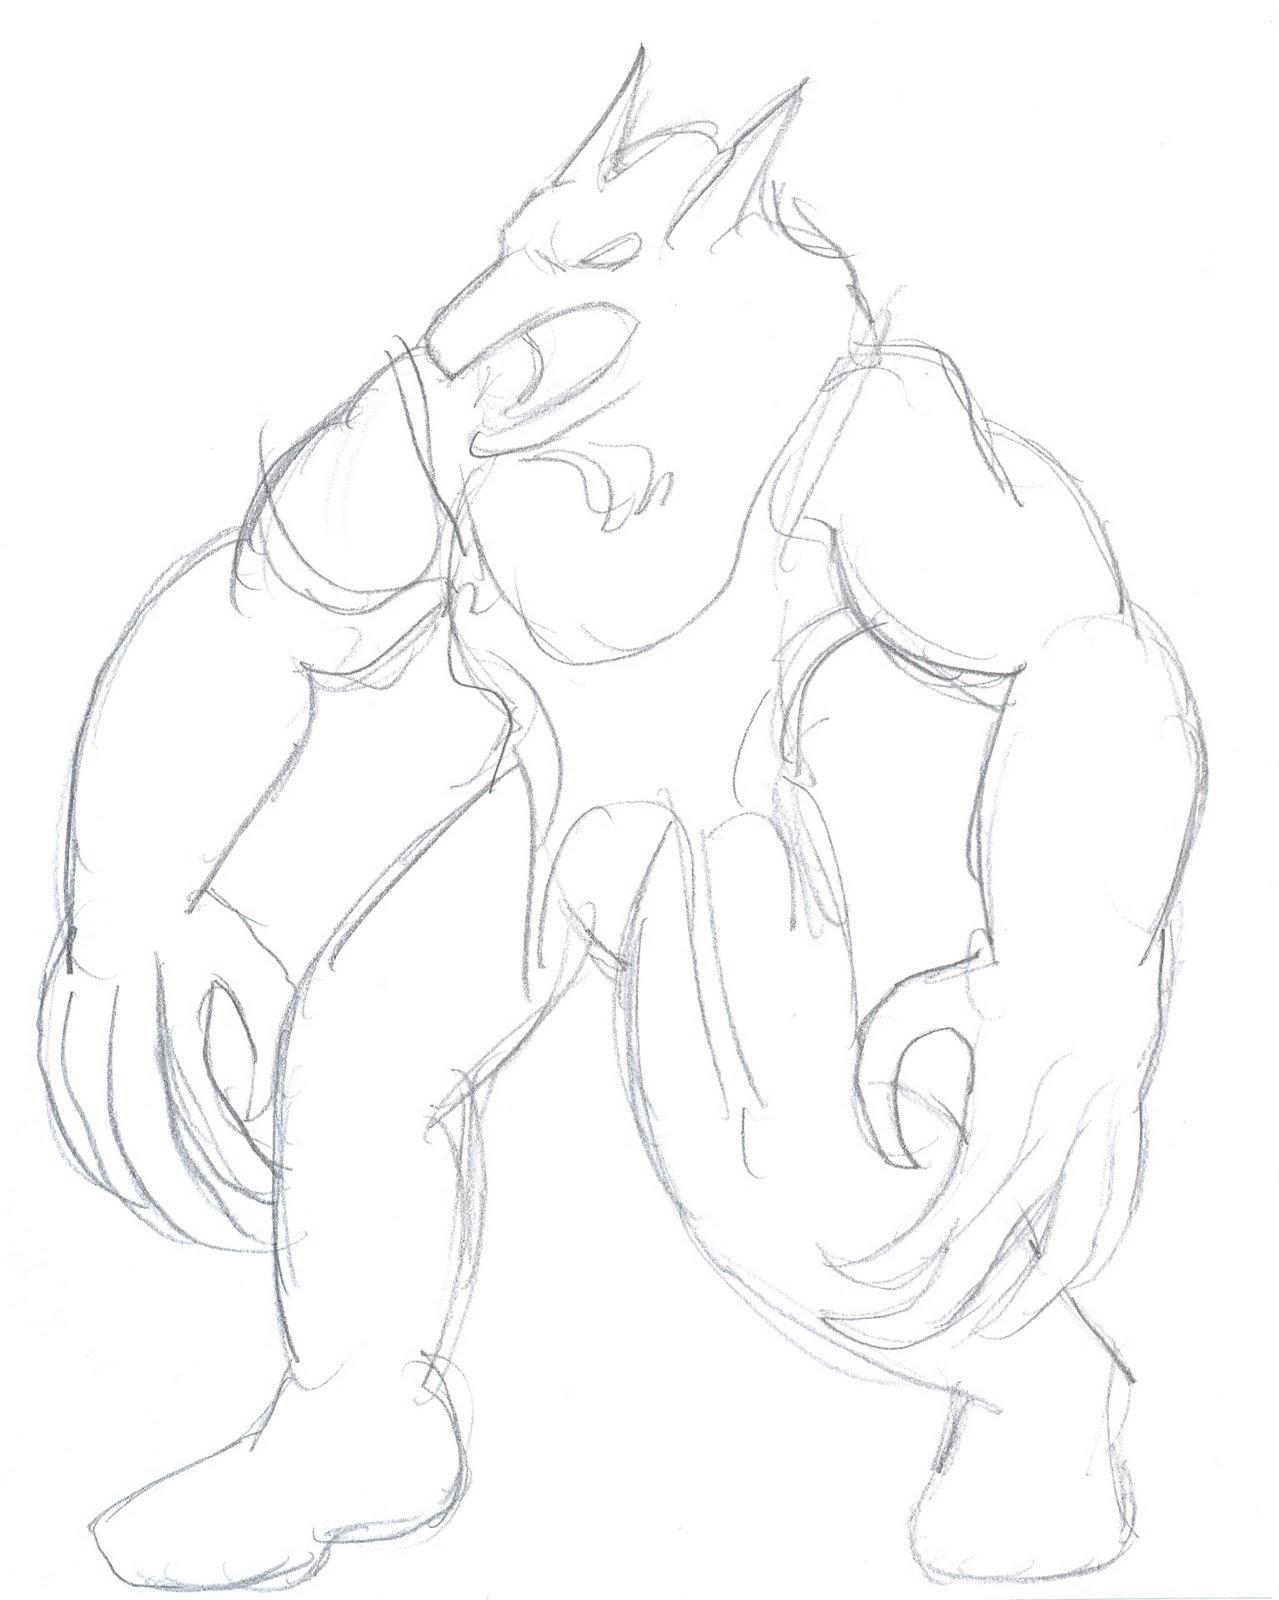 Drawn wolfman Werewolf authentic to Draw third